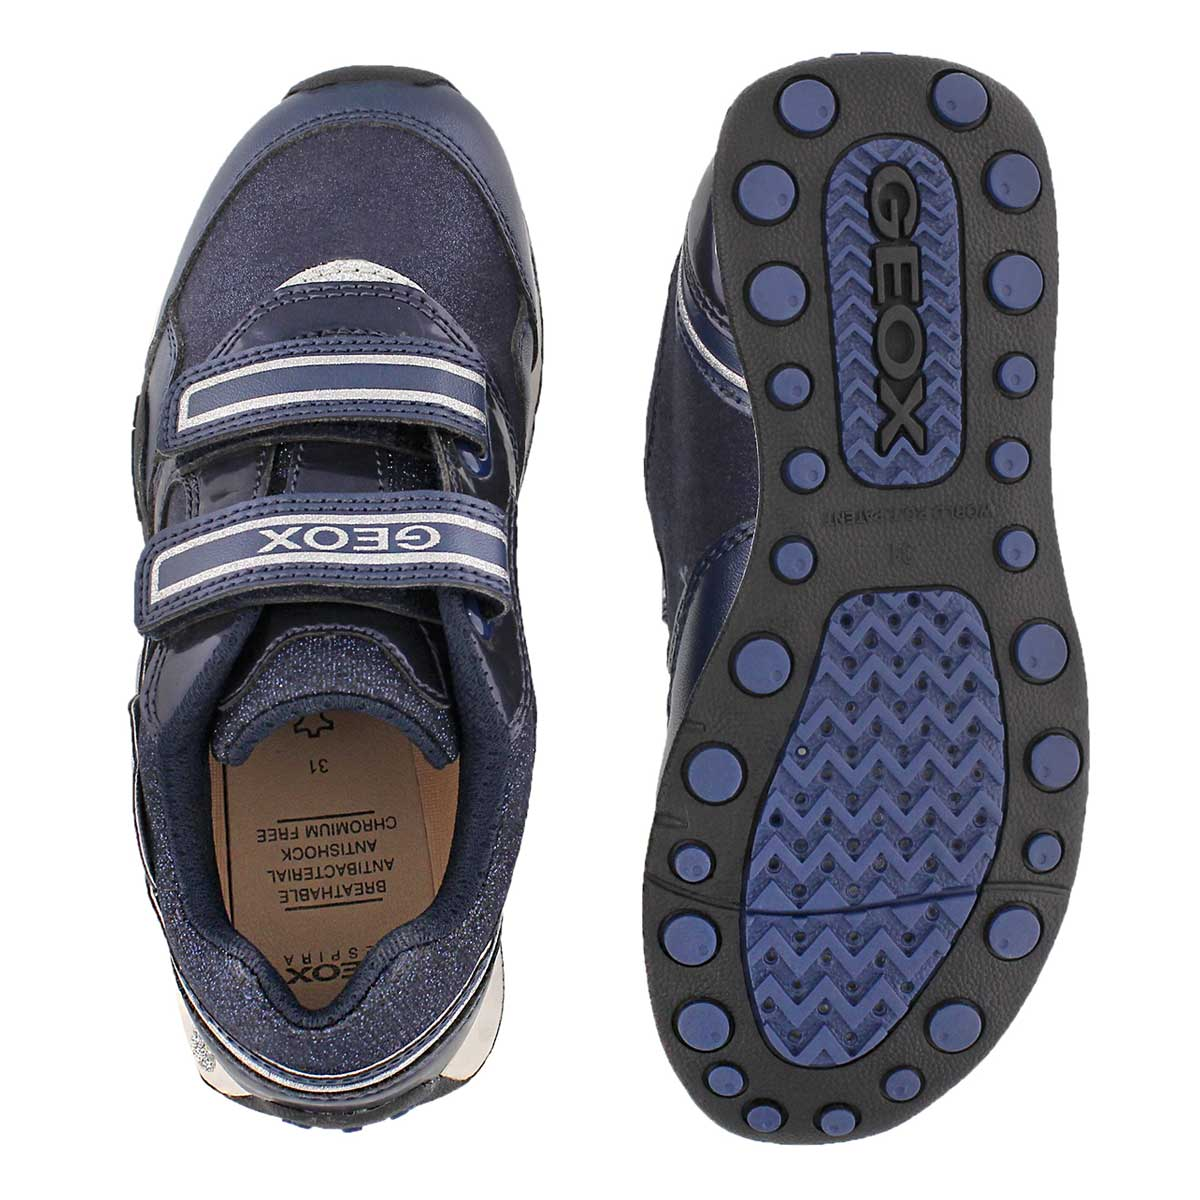 Grls New Jocker navy 2-strap sneaker